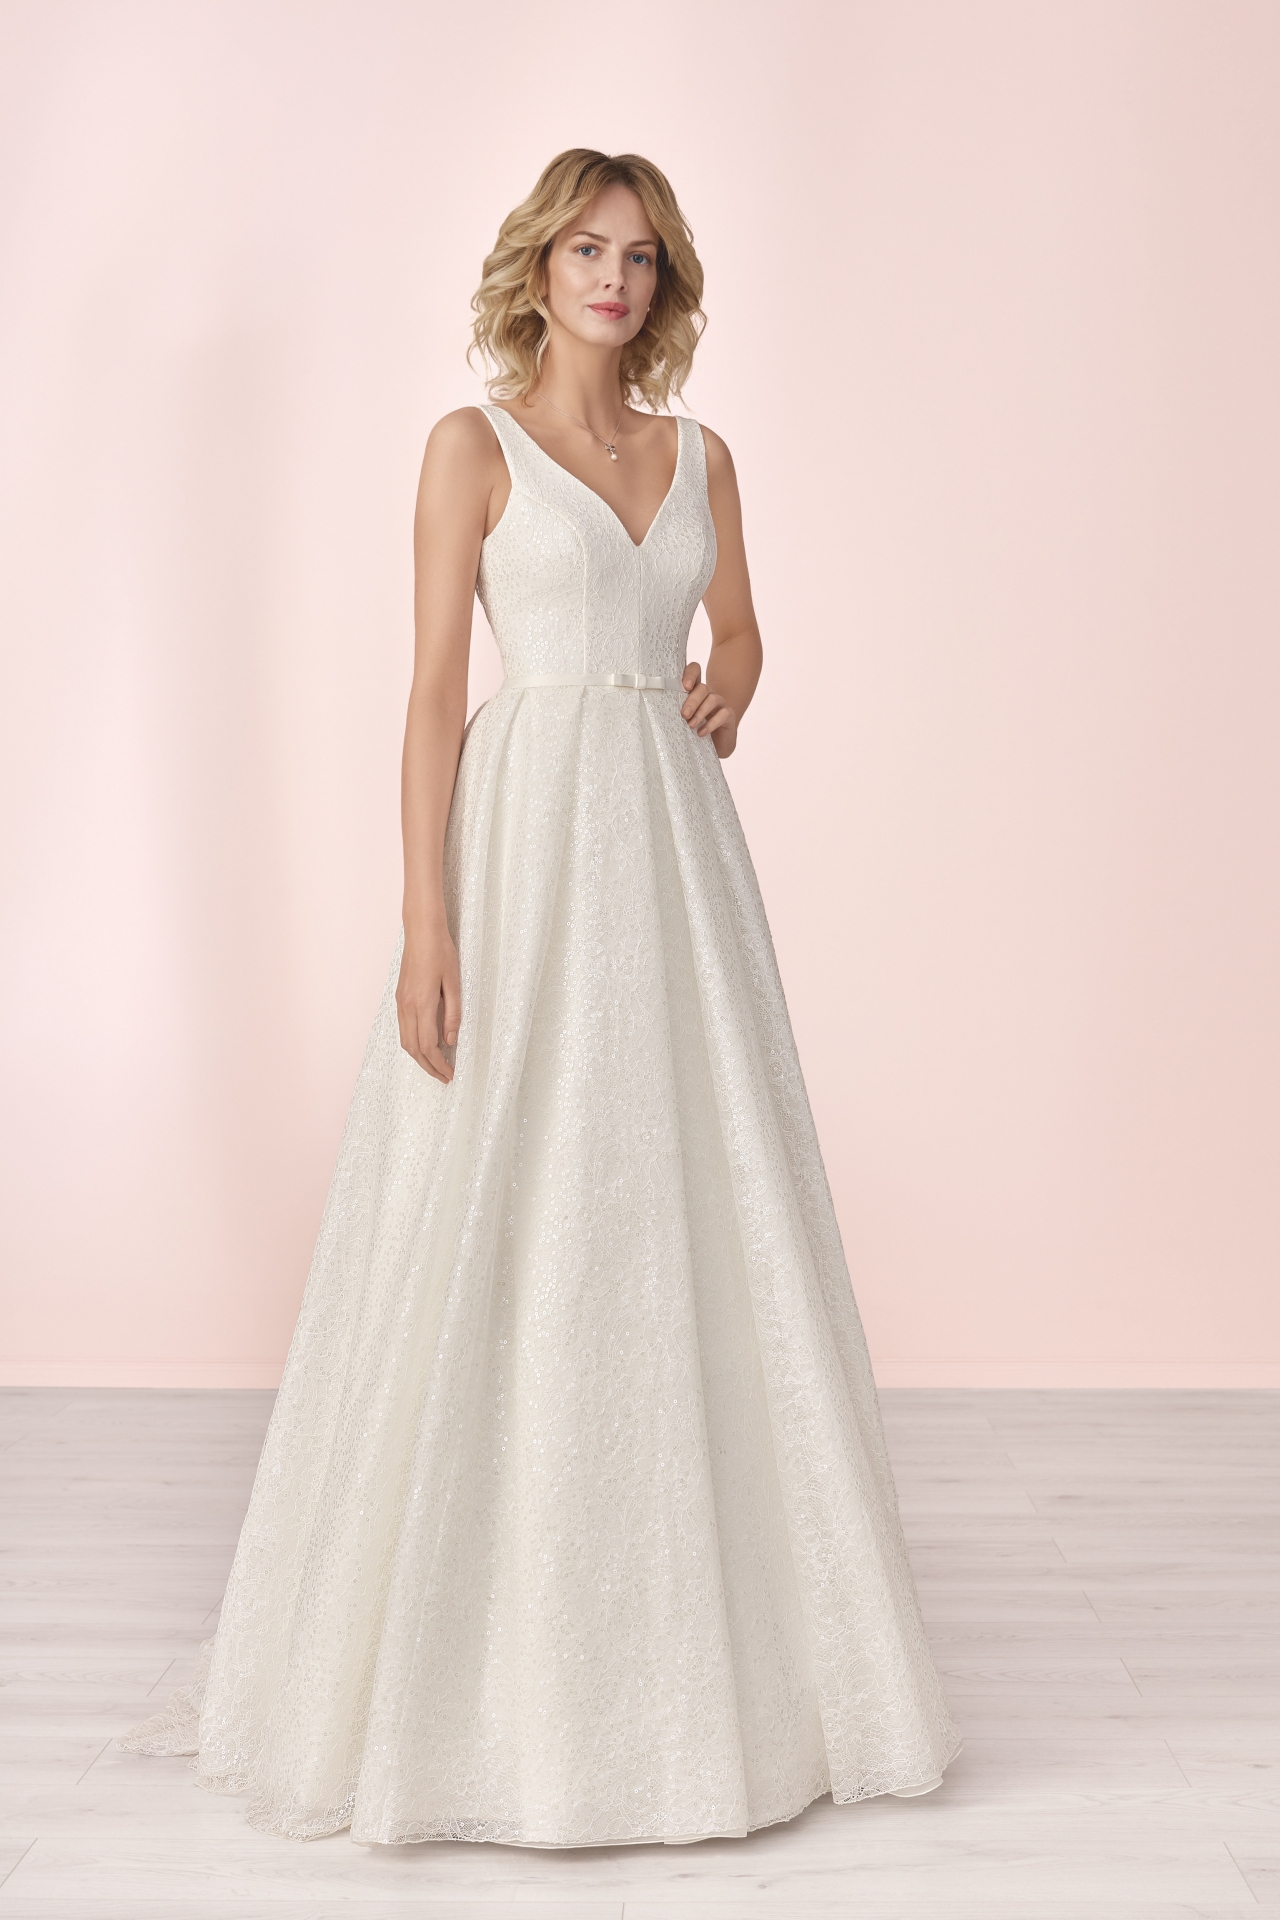 Brautkleid Elizabeth Konin 2019 - 4128T-1